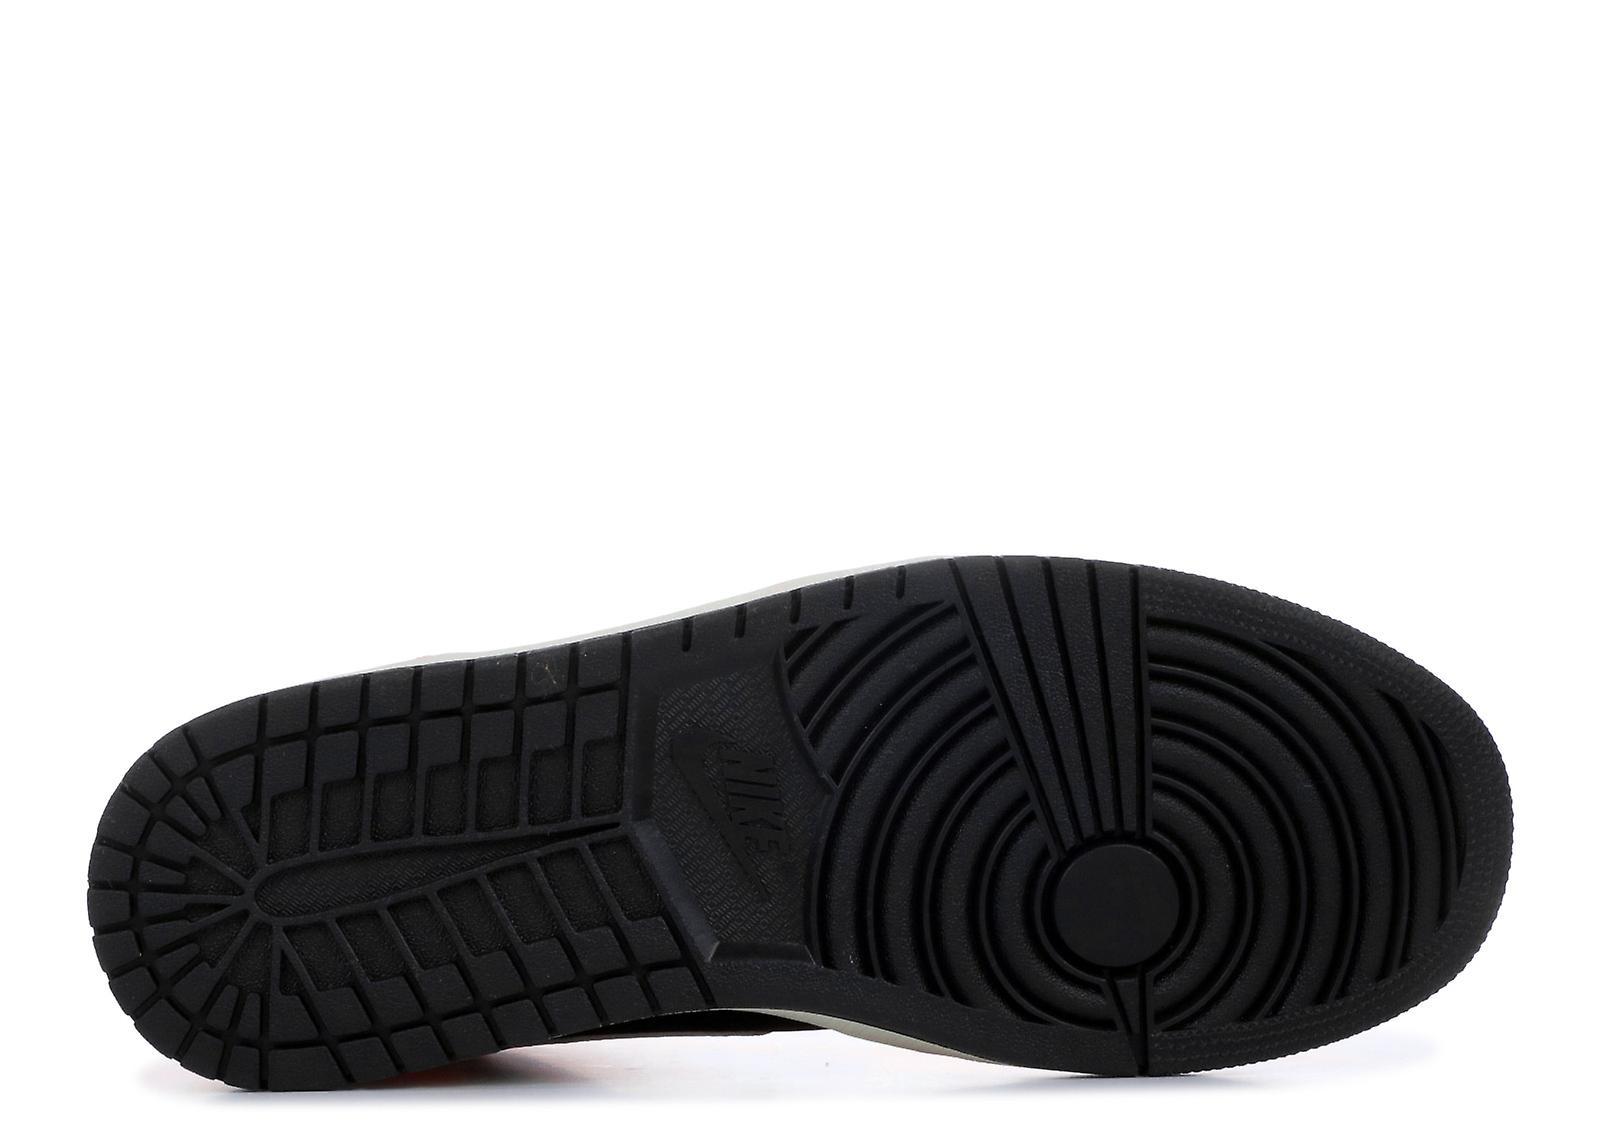 Air Jordan 1 Mid-554724-062-scarpe JKF4Ne